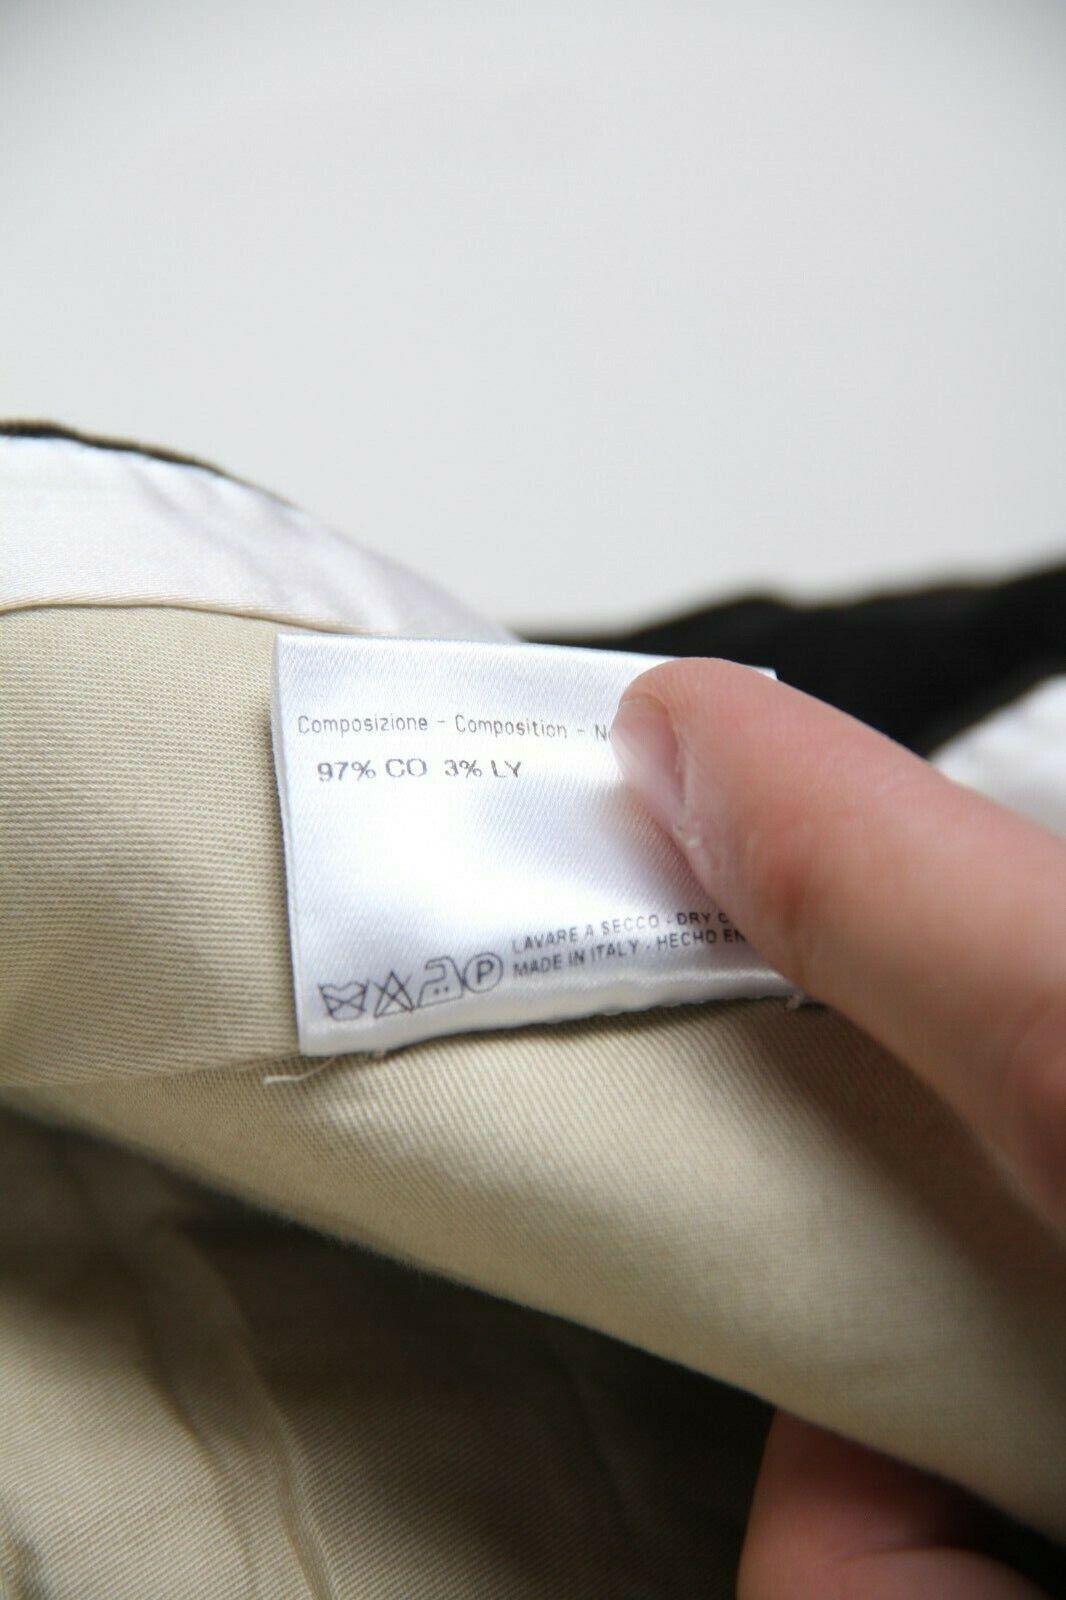 CORTINA 1980s Reversible Stranger Things Inspired Corduroy /& Nylon Puff Vest Size M